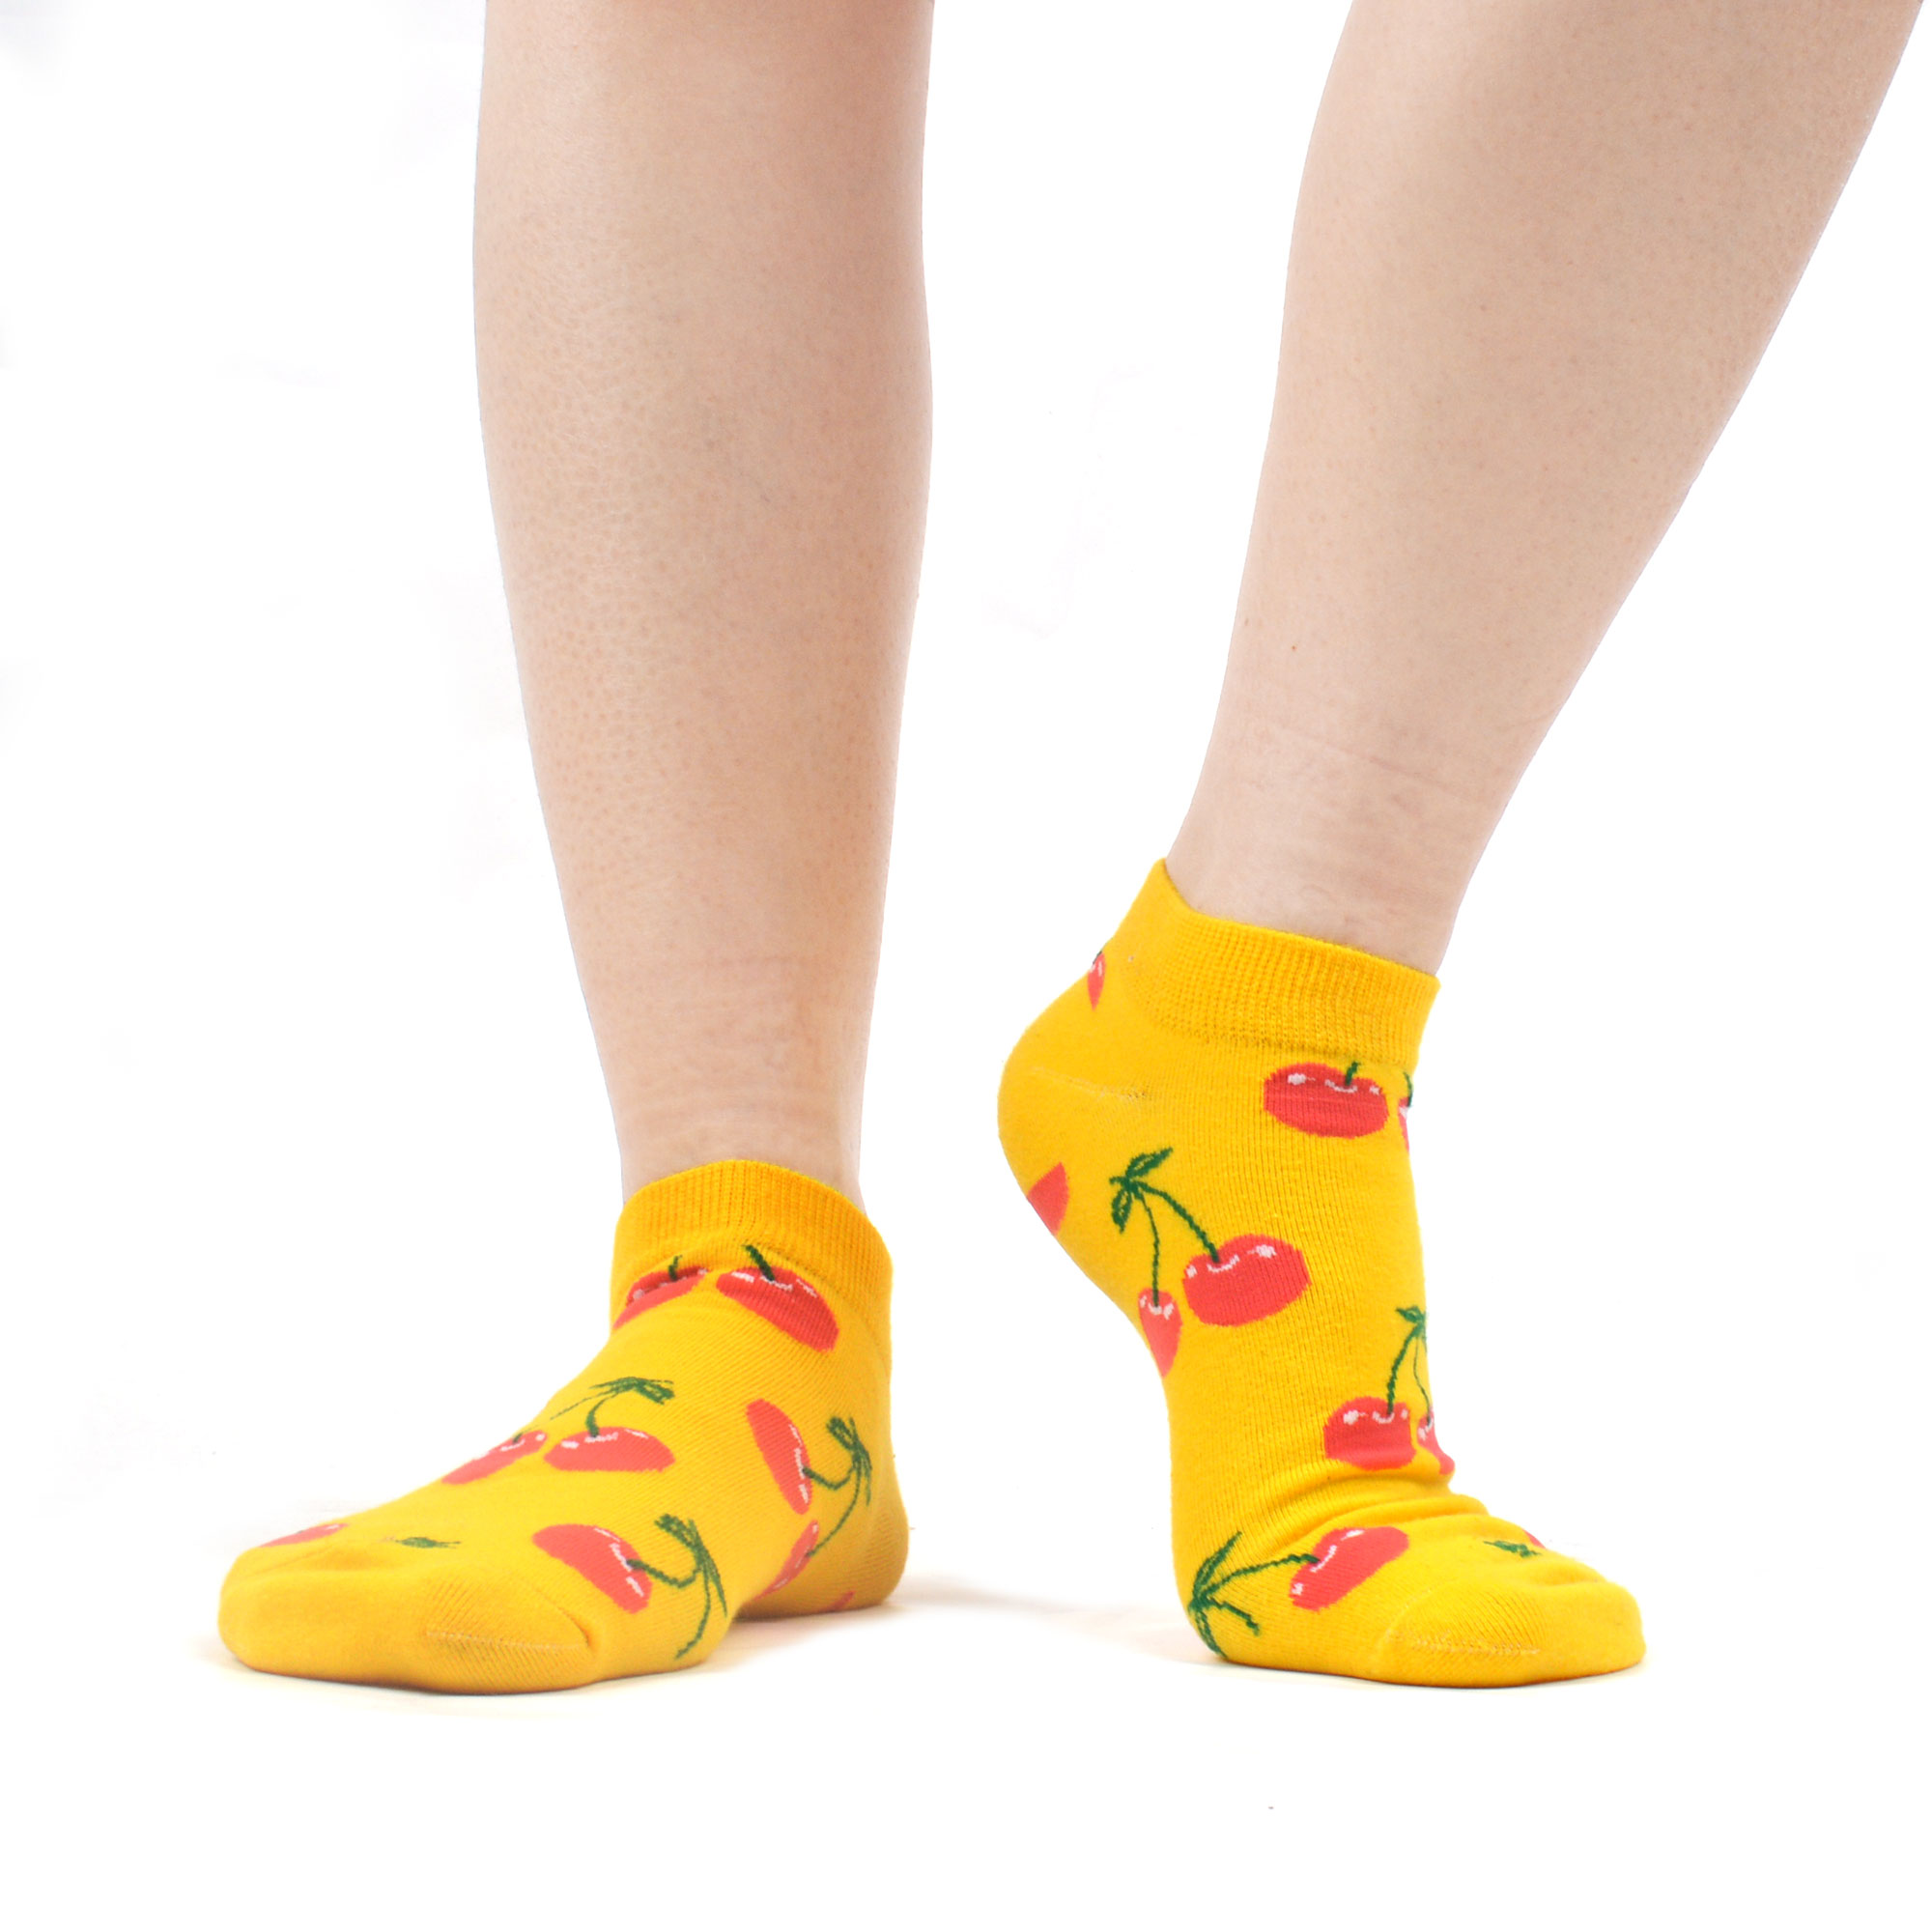 Image 2 - SANZETTI 12 Pairs/Lot Summer Women Casual Novelty Colorful Combed Cotton Ankle Socks Harajuku Happy Short Socks Plaid Tend SocksSocks   -